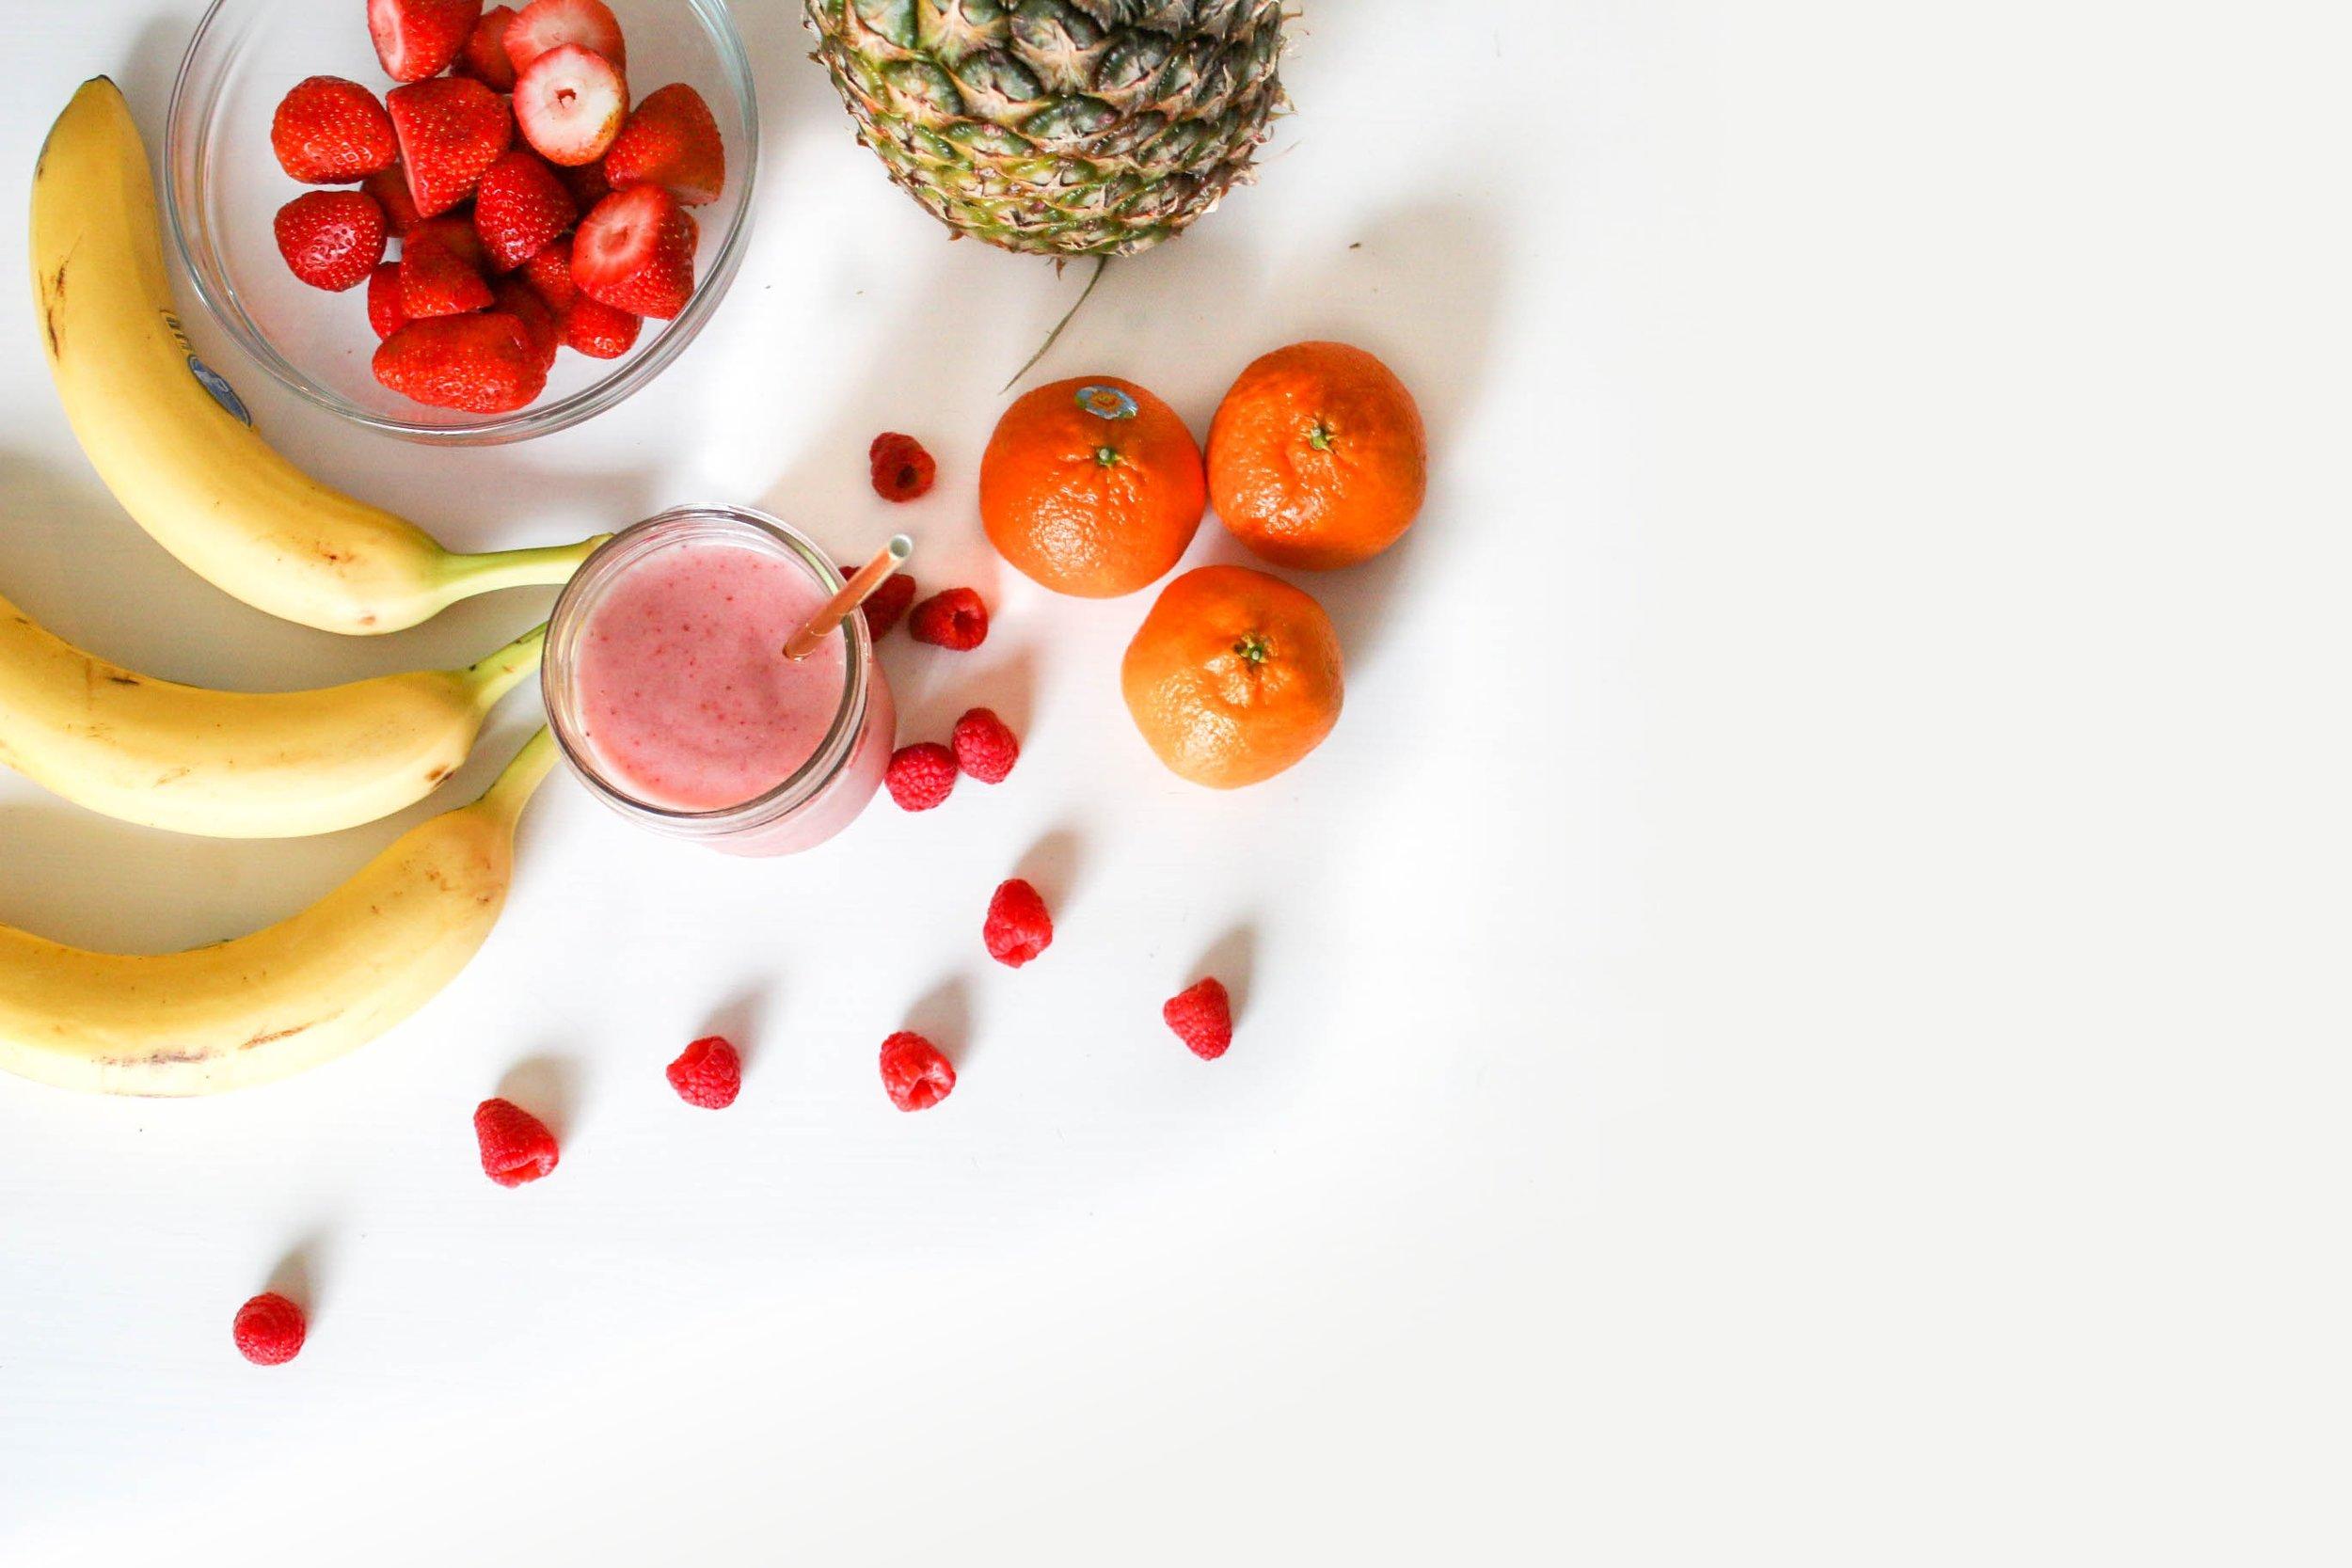 fruits_snacks